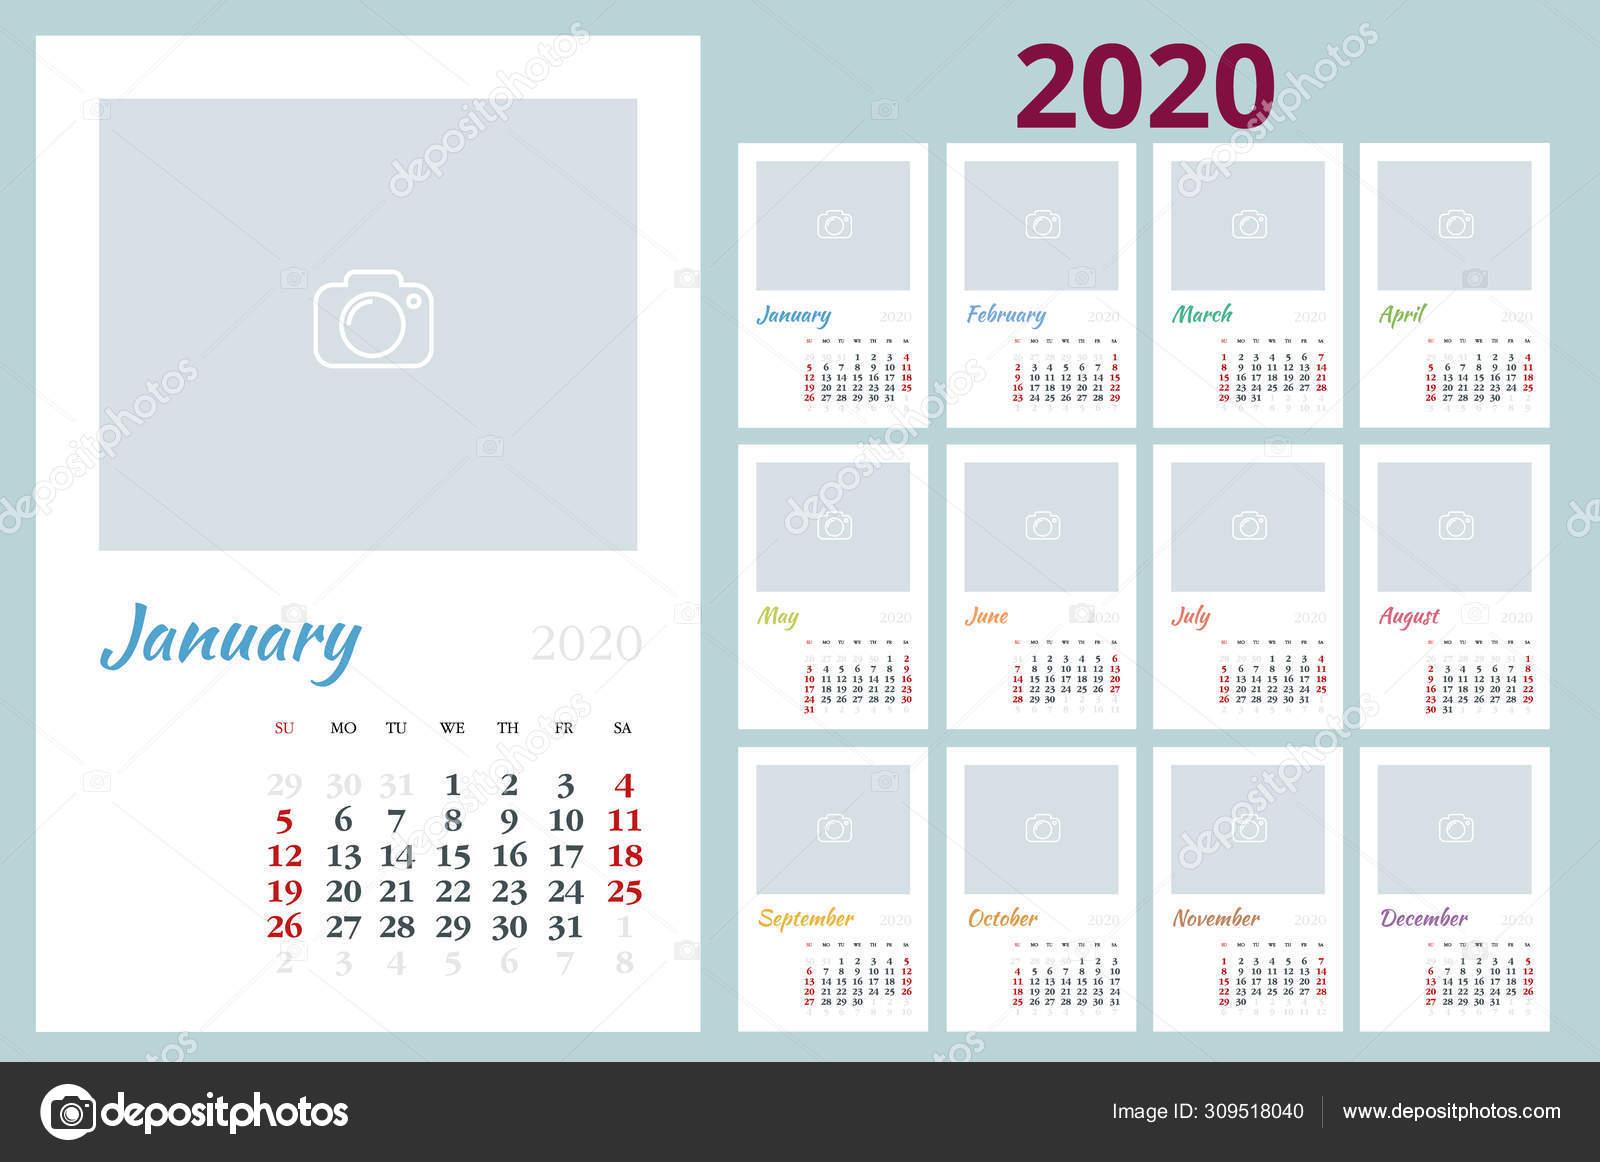 2020 Year Calendar. Holiday Event Planner. Week Starts